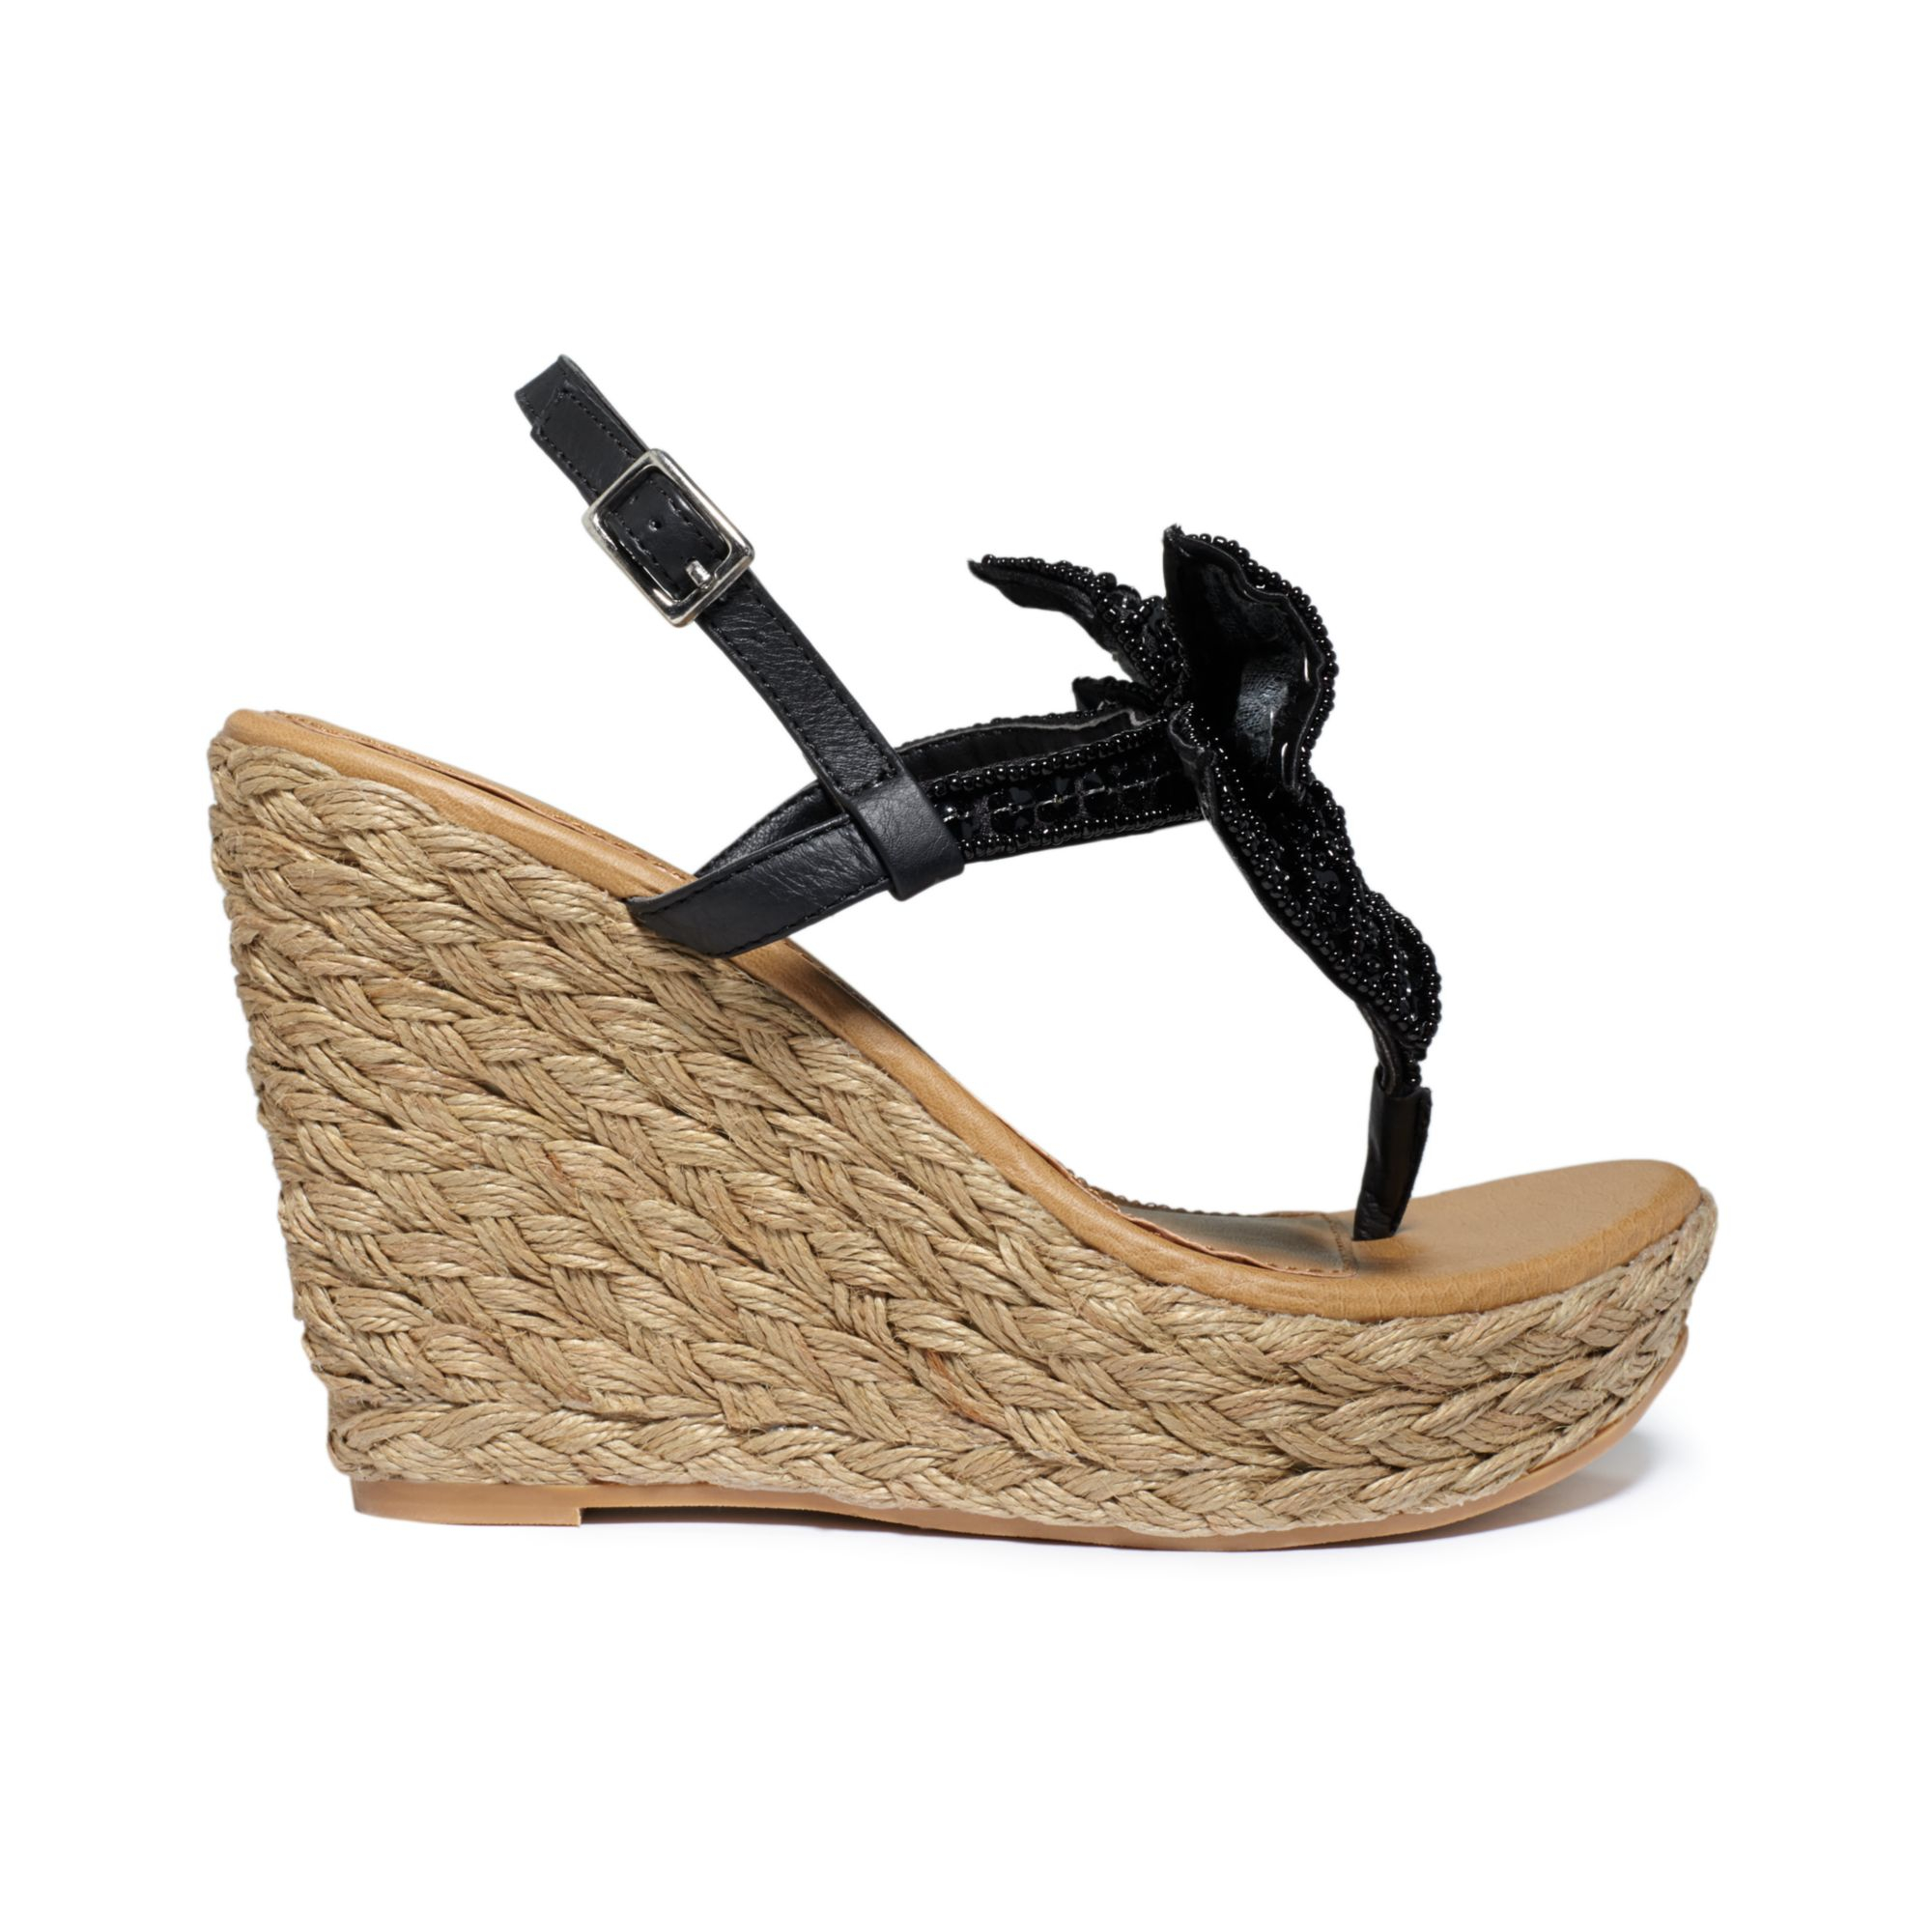 05e427c9e Lyst - Naughty Monkey Feel Free Platform Wedge Thong Sandals in Black